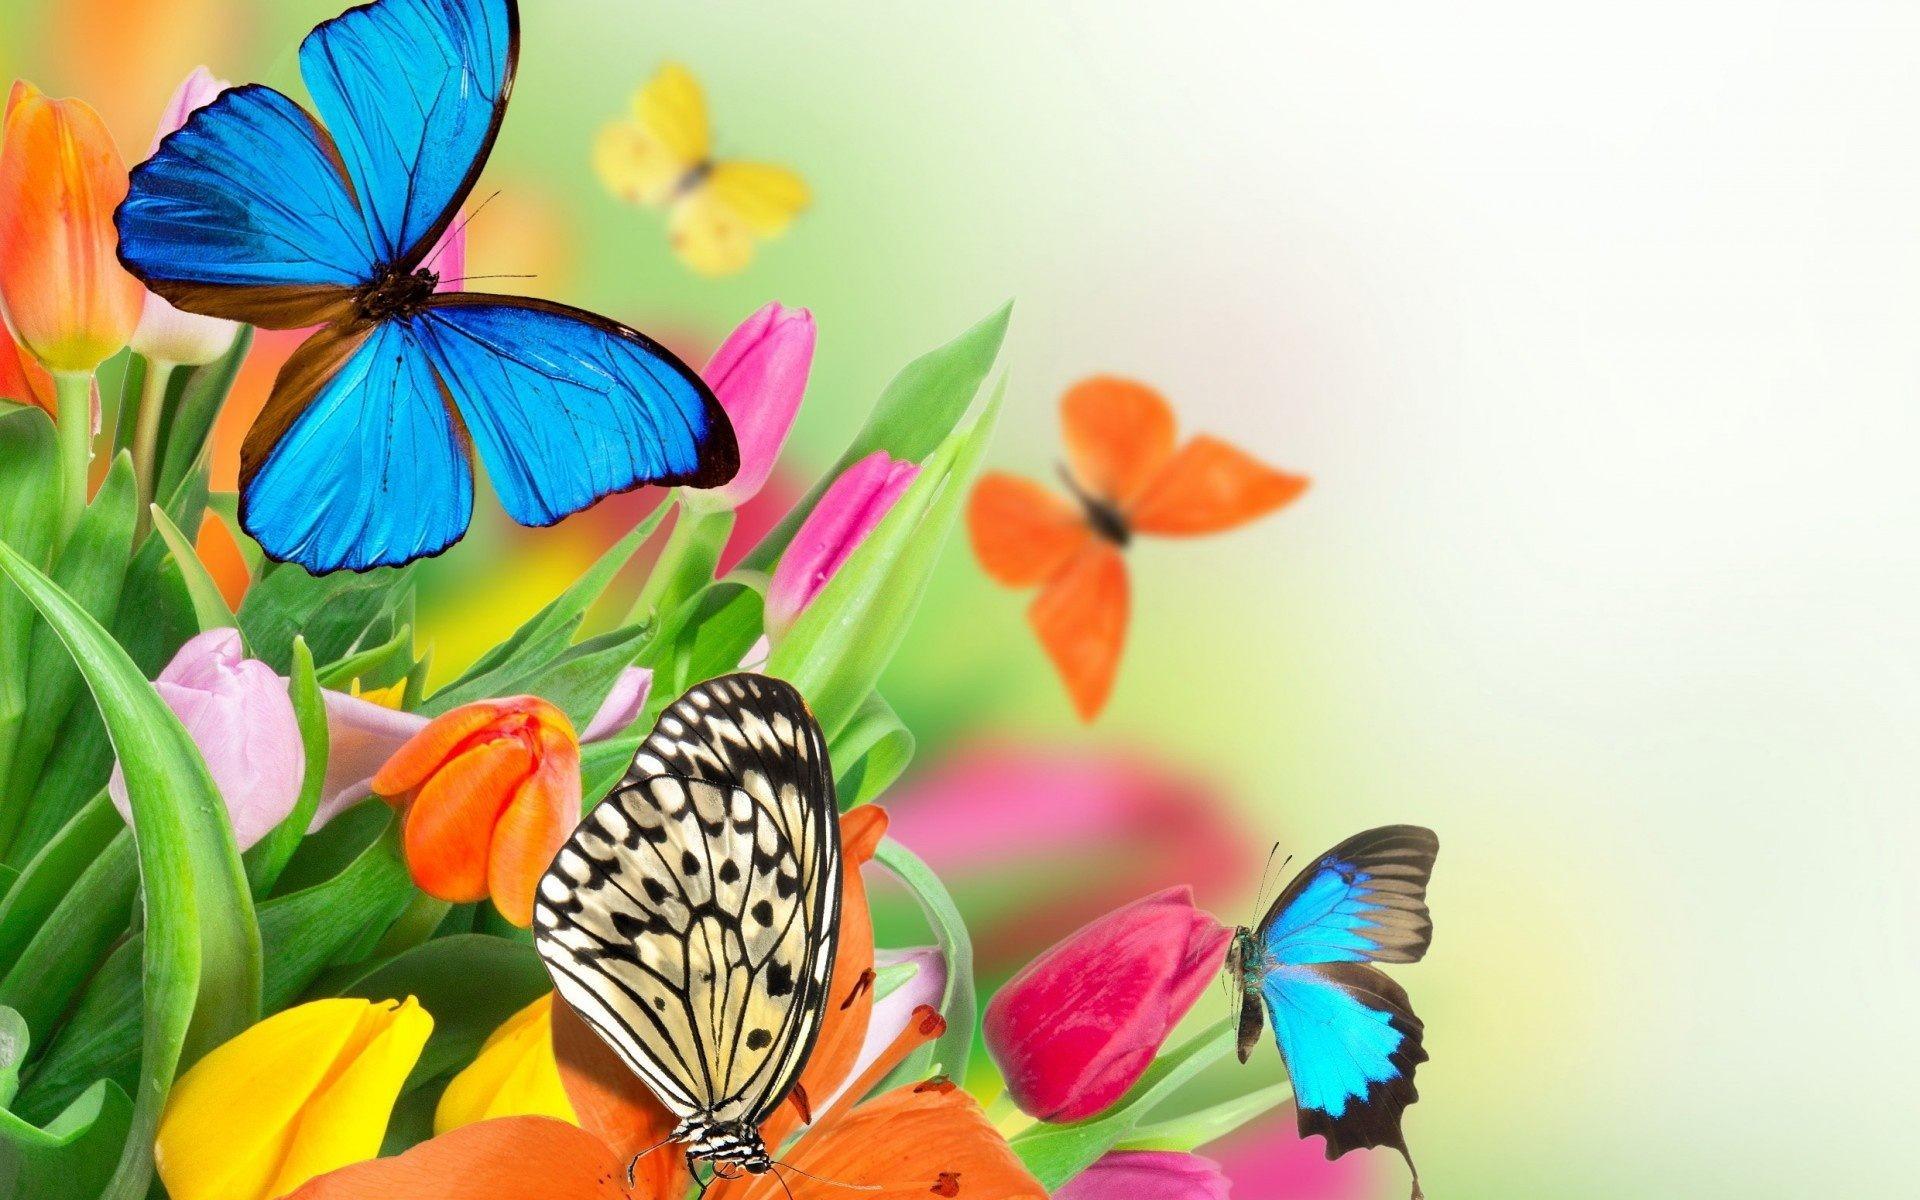 Colorful Butterfly On Flower Wallpaper For Desktop amp Mobile